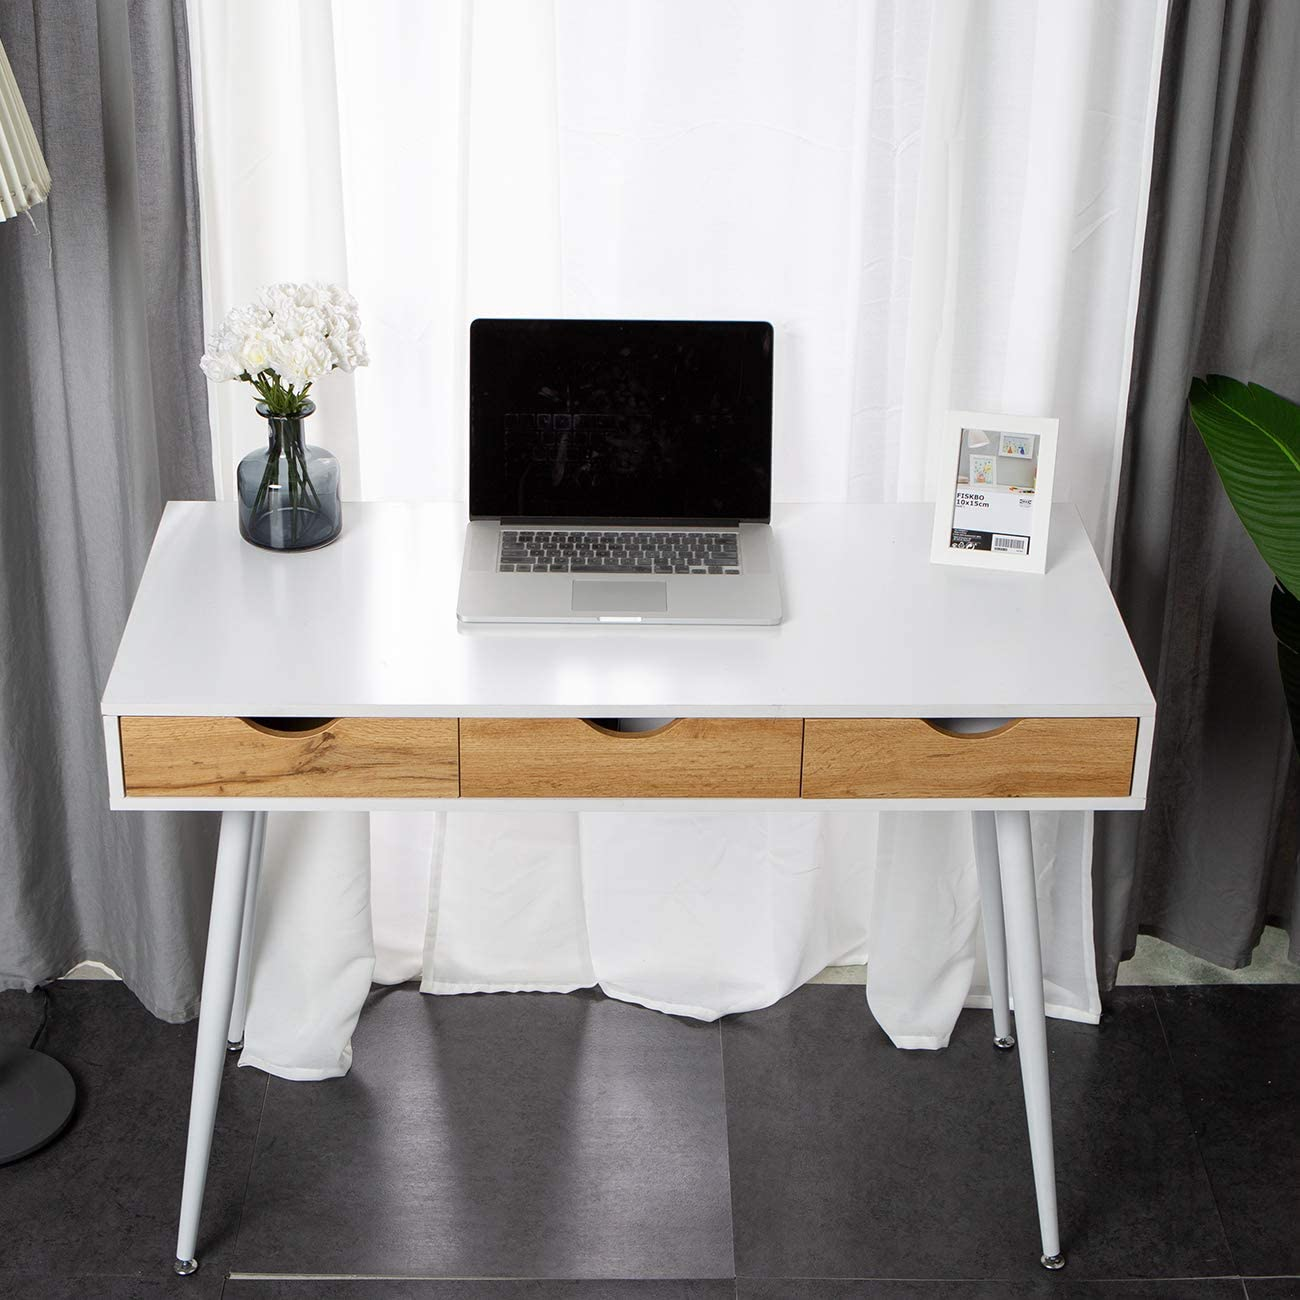 DlandHome 43 Inches Home Desk